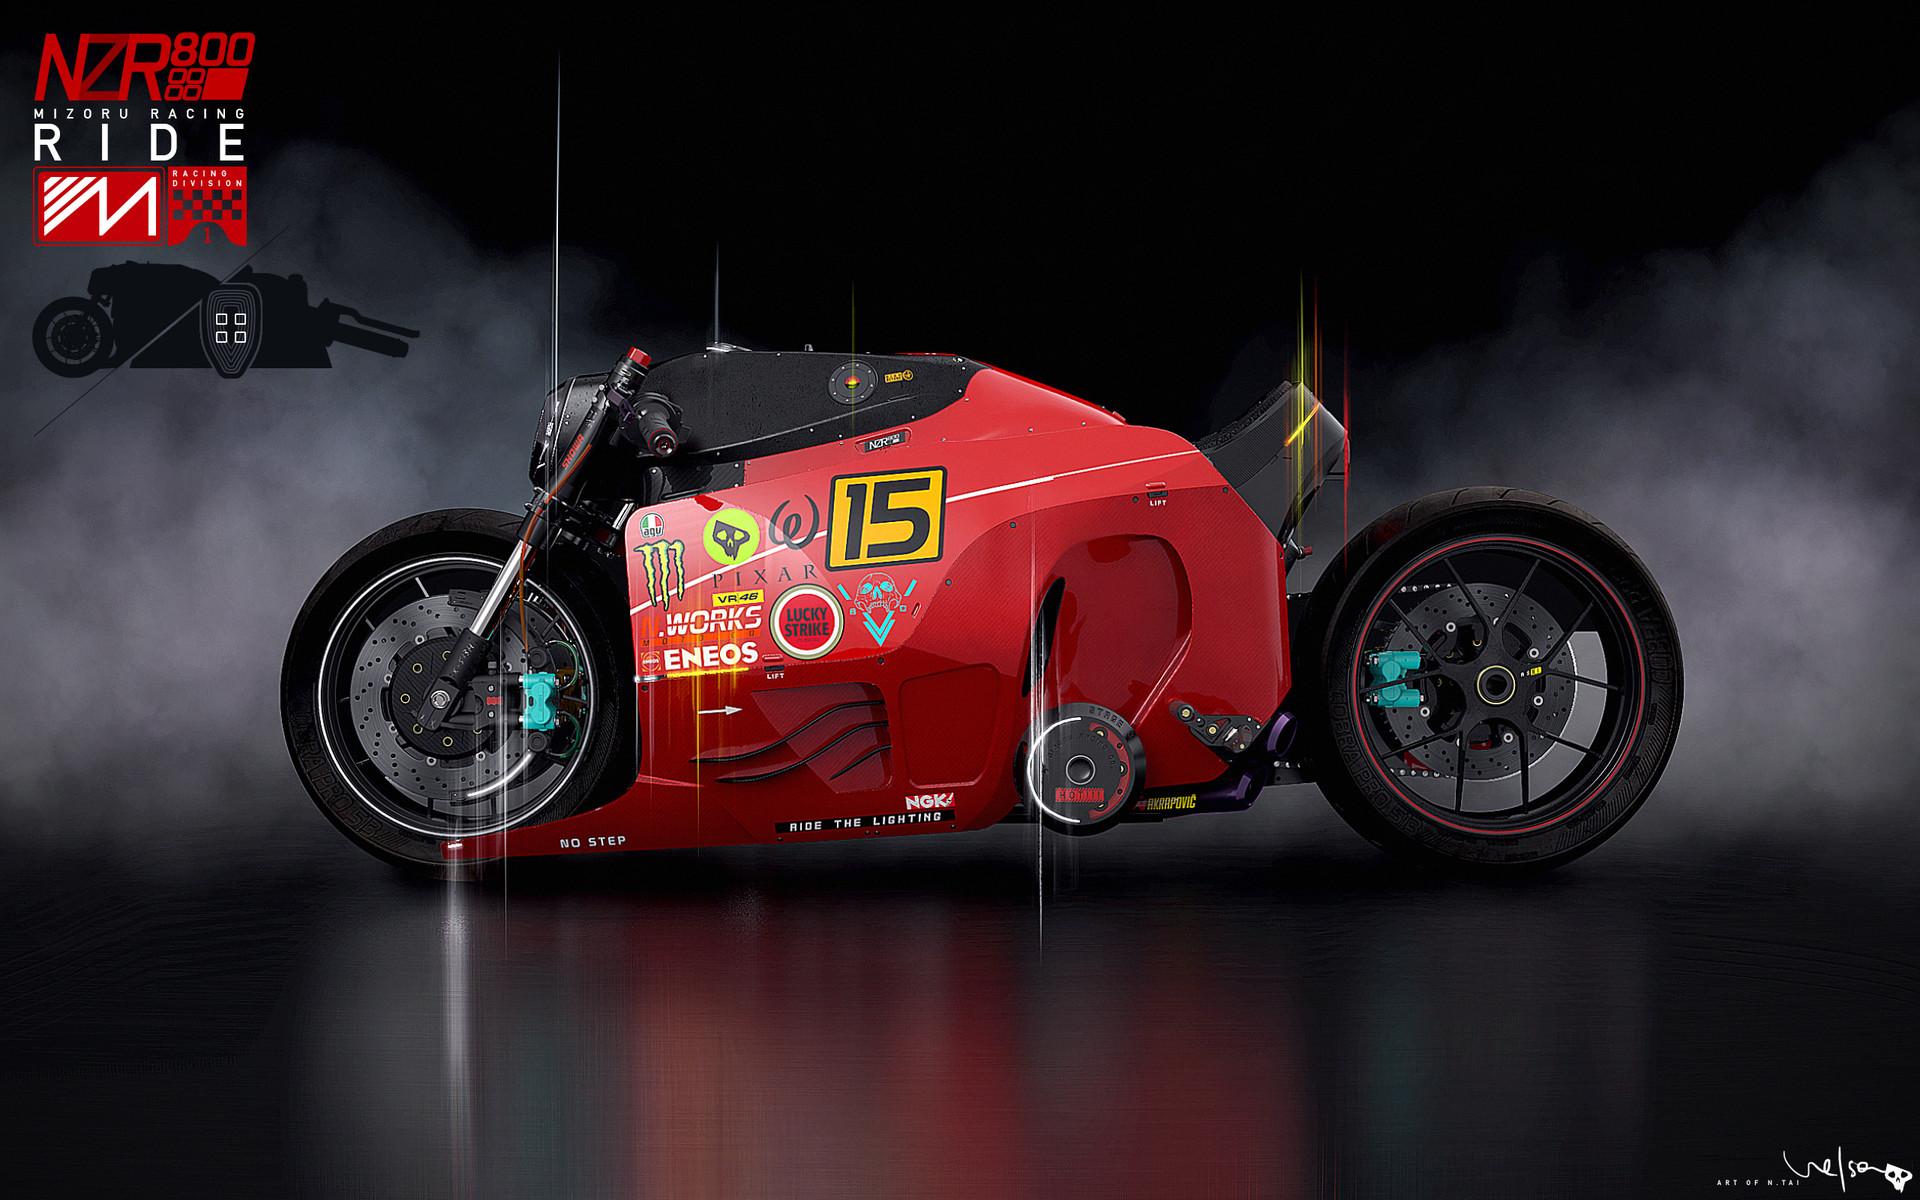 Nelson tai nzr500 dsgn bike side 001a